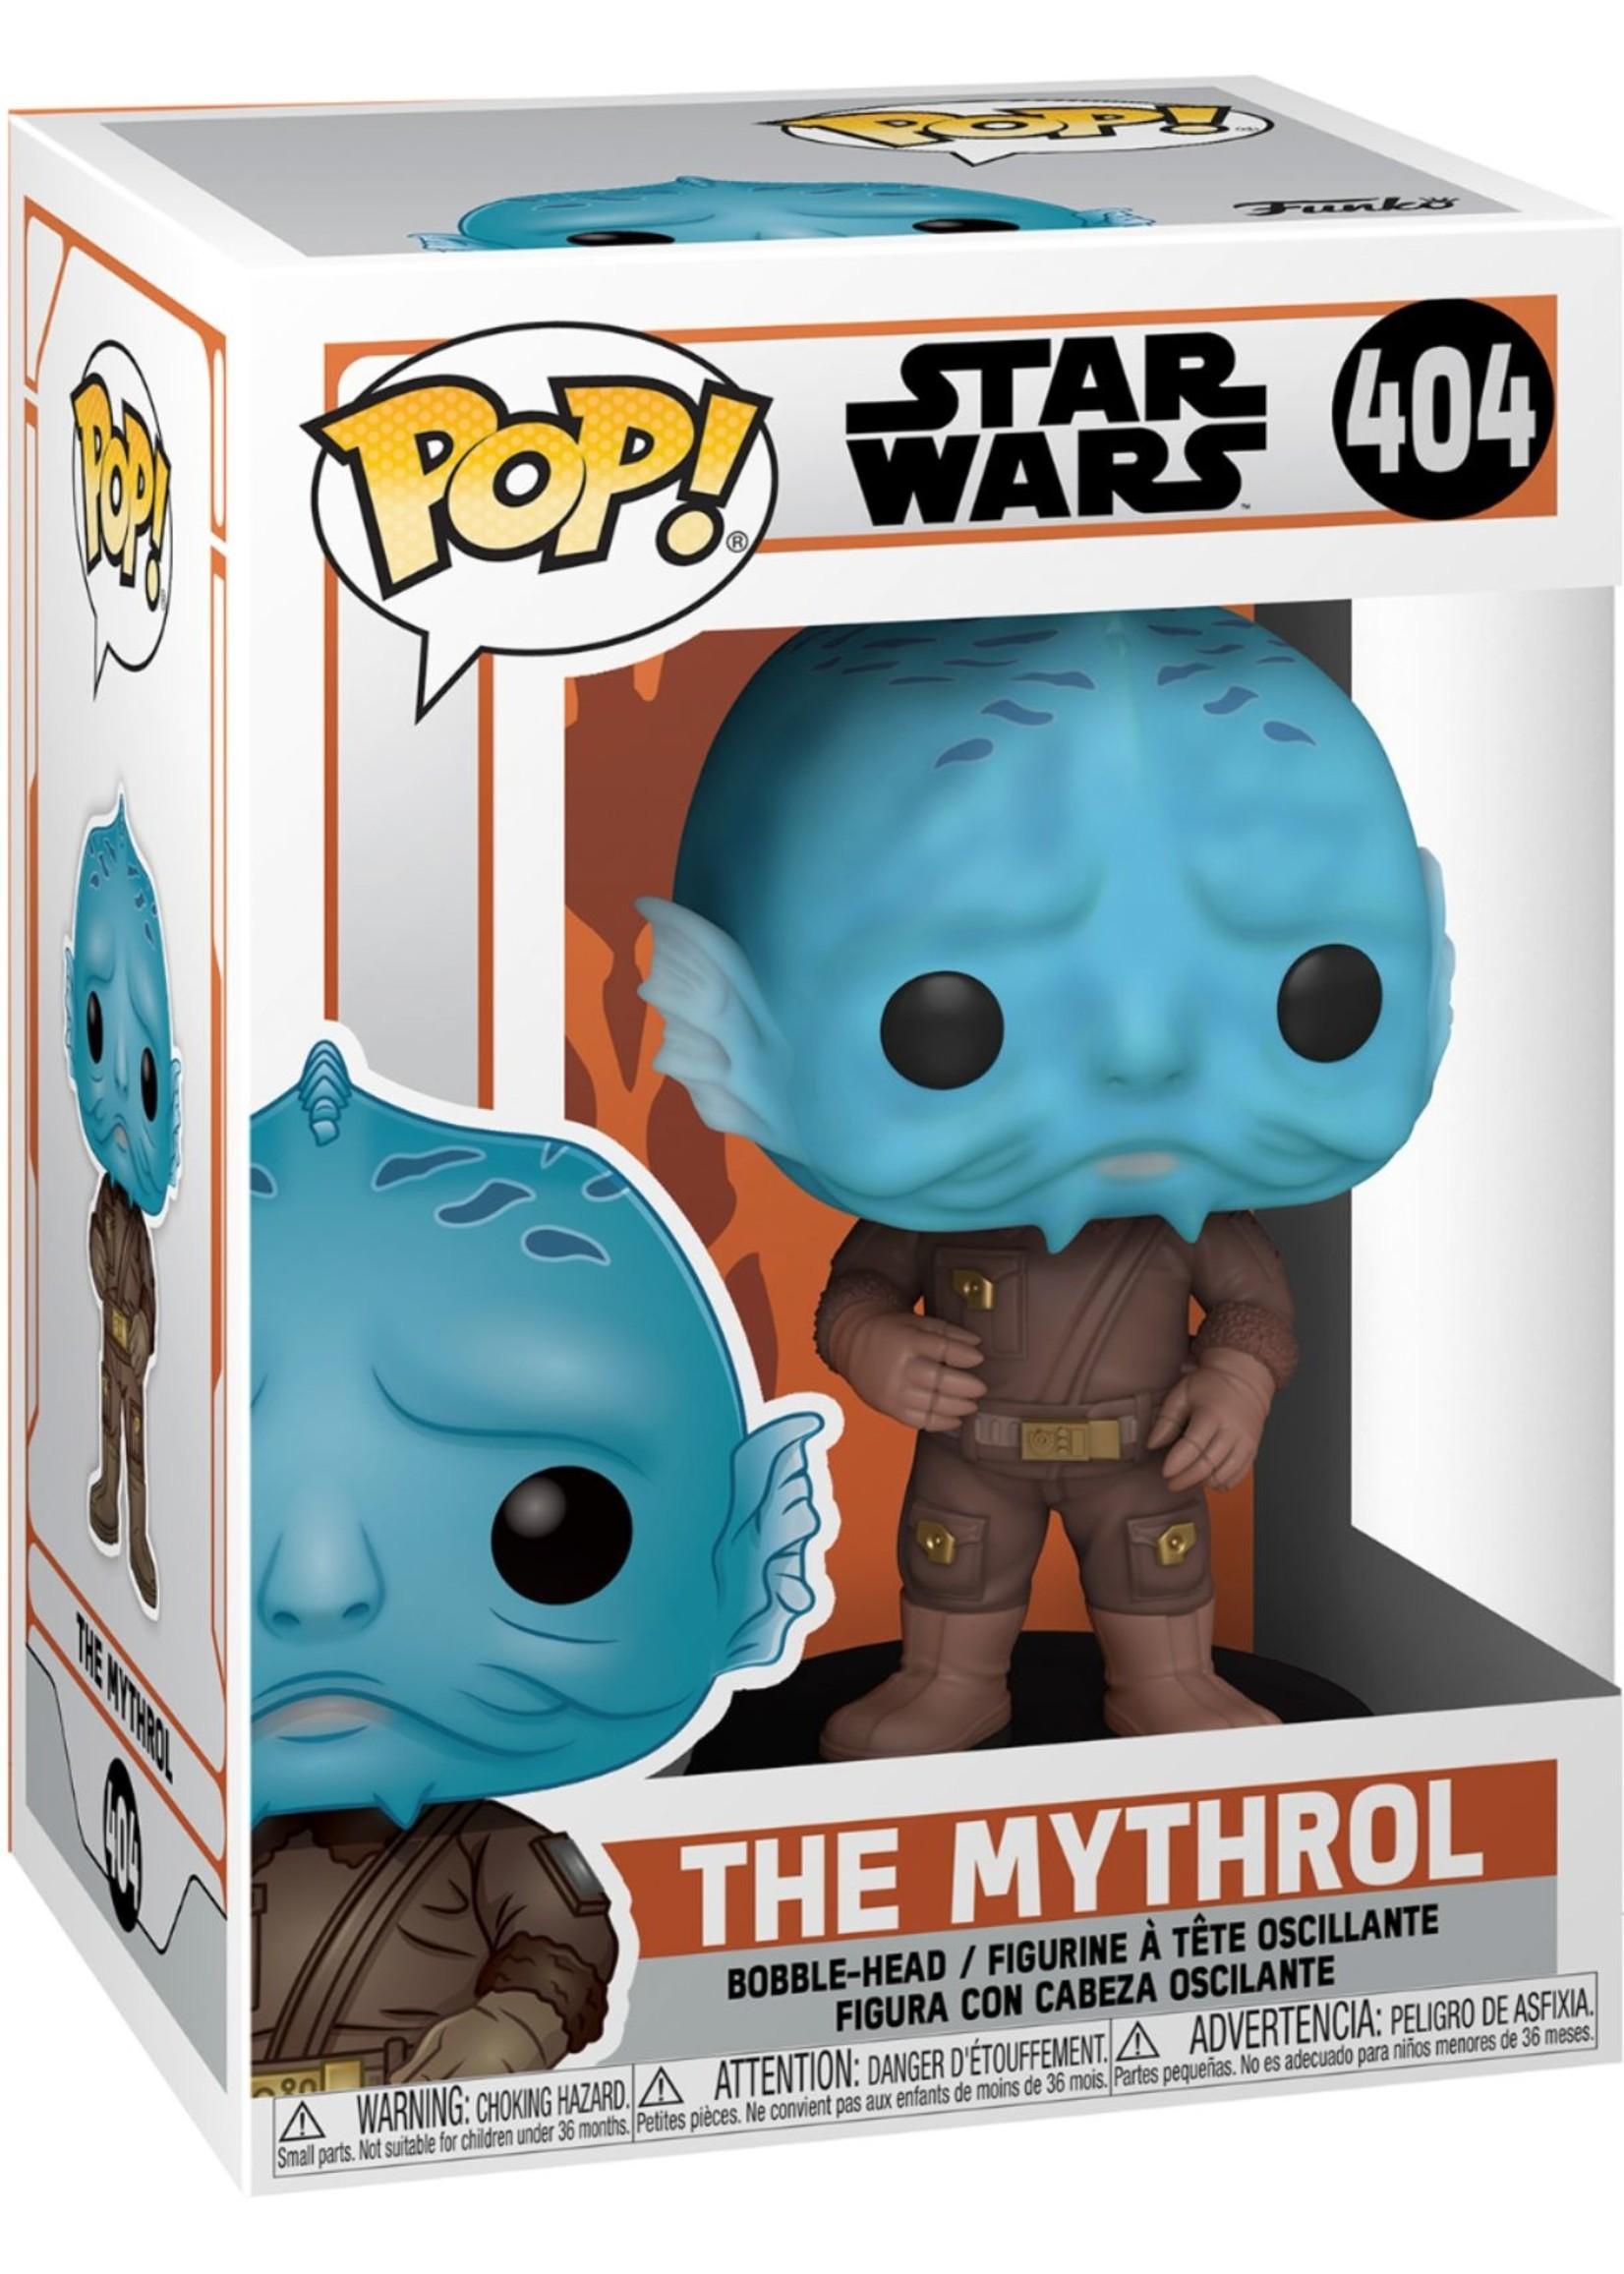 Star Wars The Mandalorian - The Mythrol